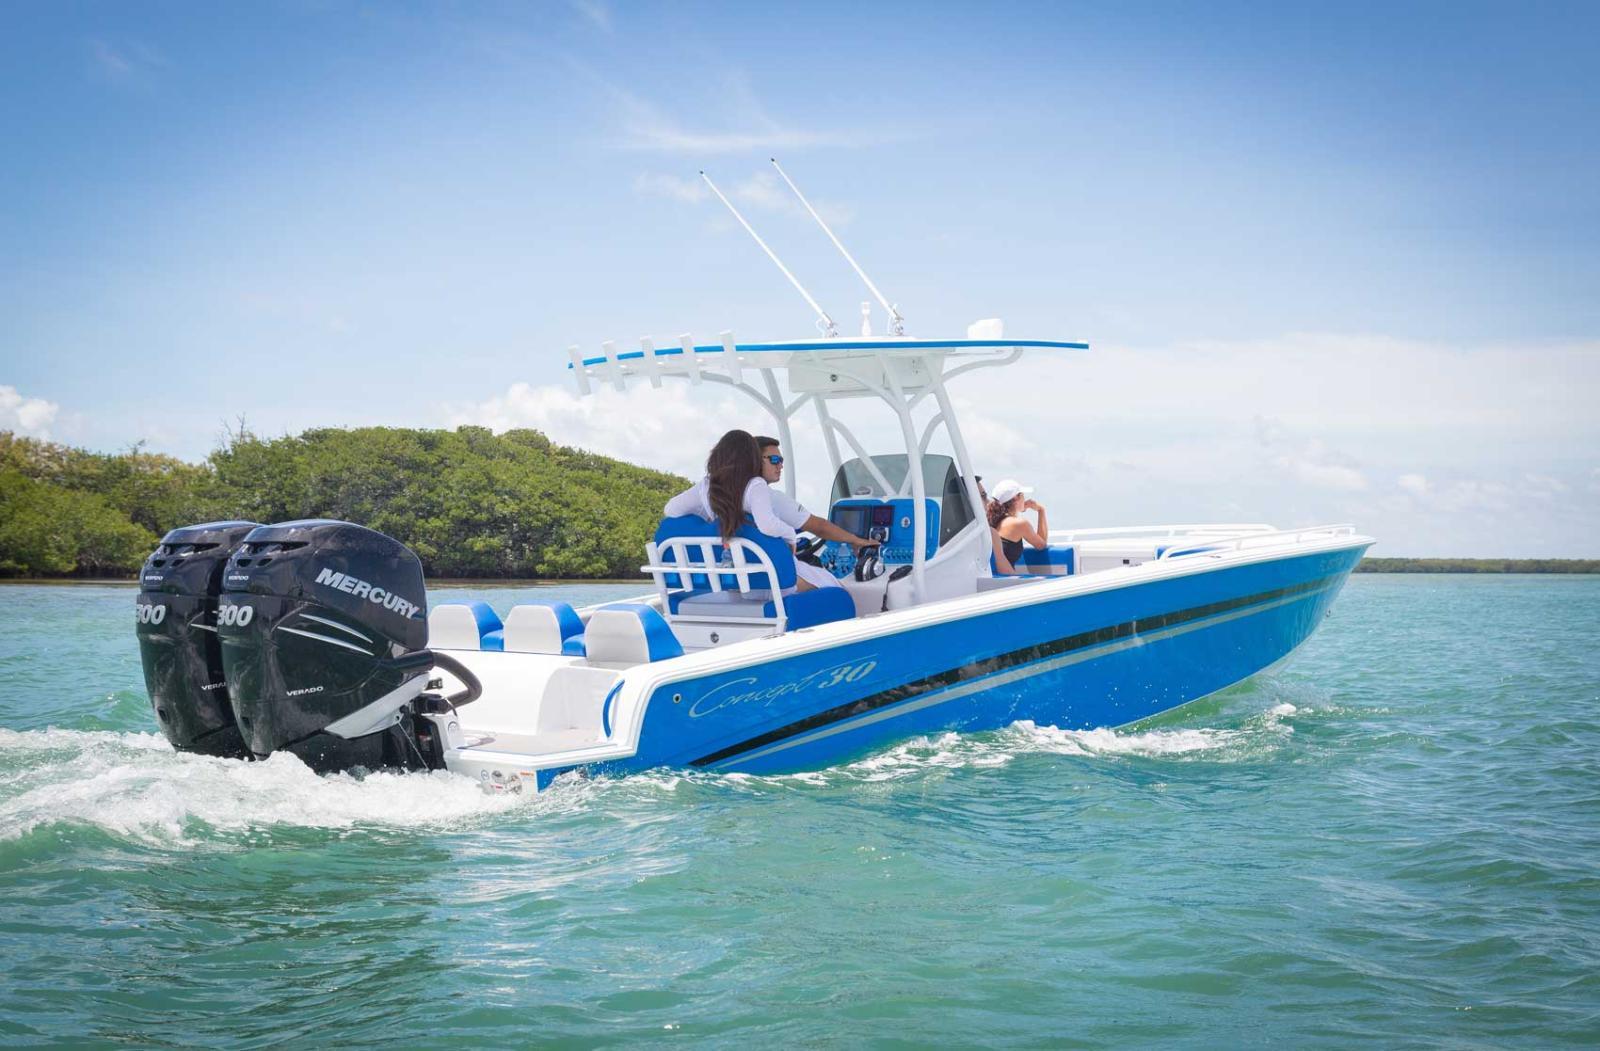 30 Cuddy Cabin Series Concept Boats